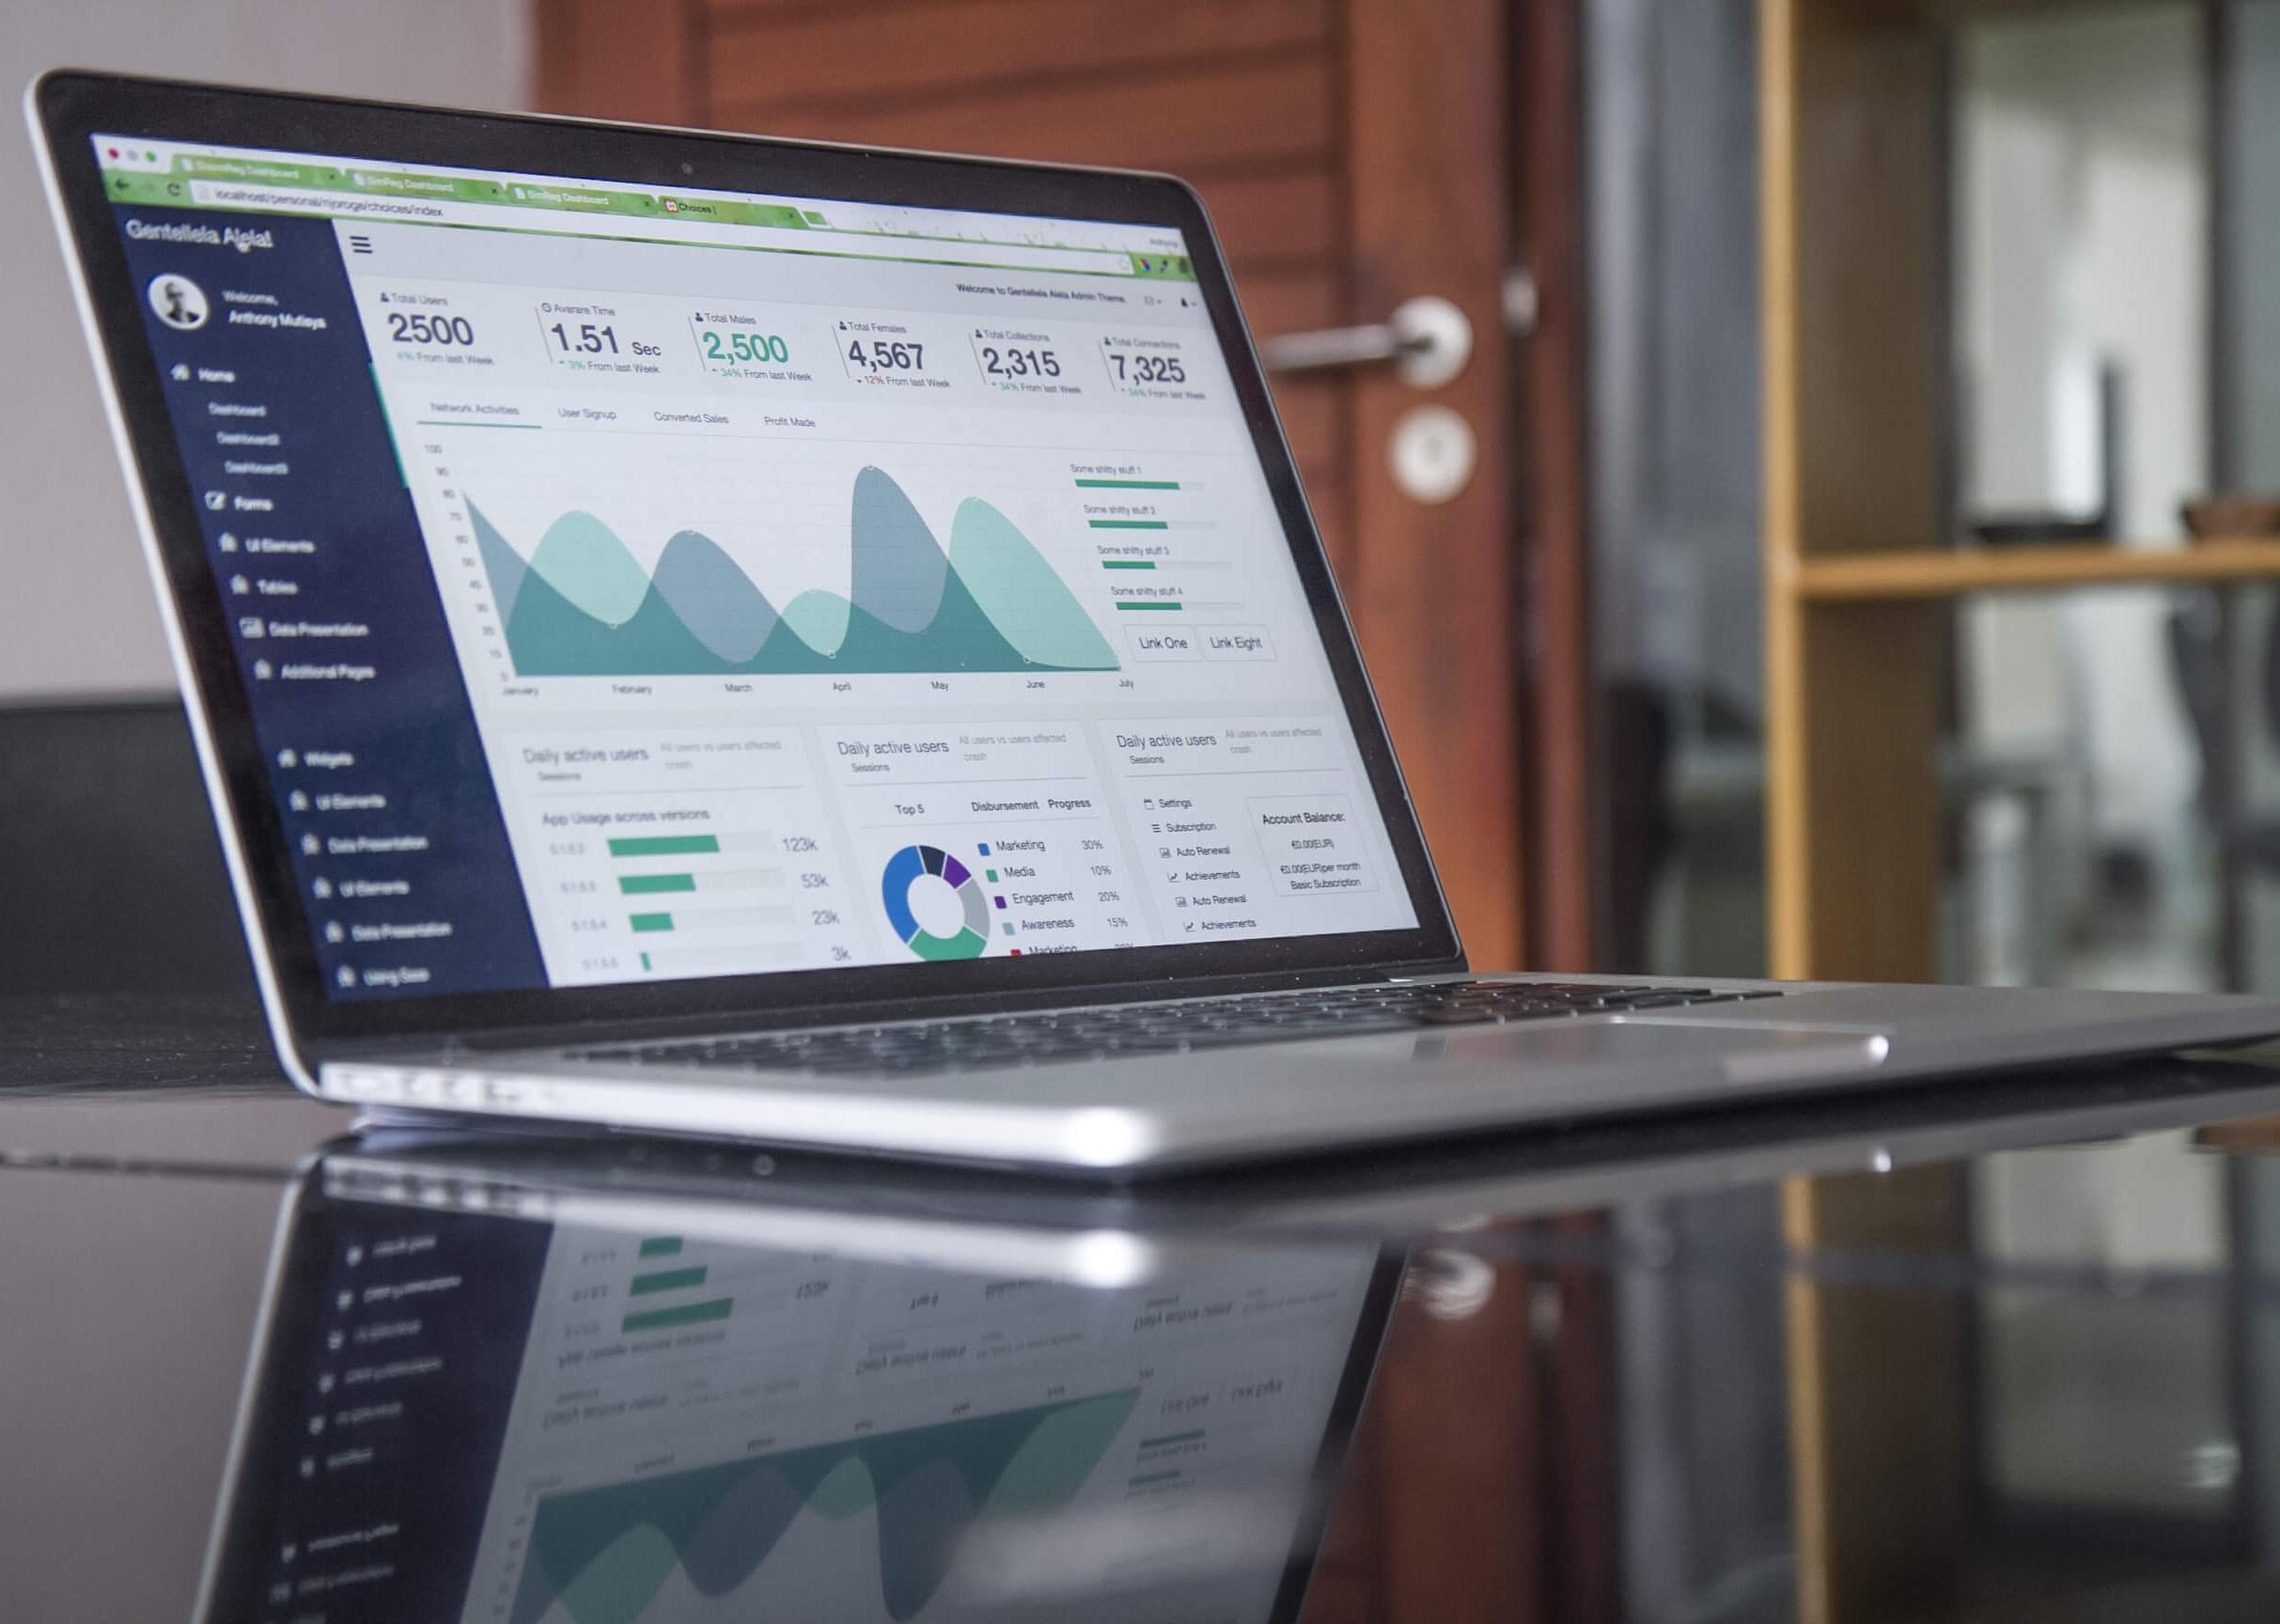 Evaluer un site internet